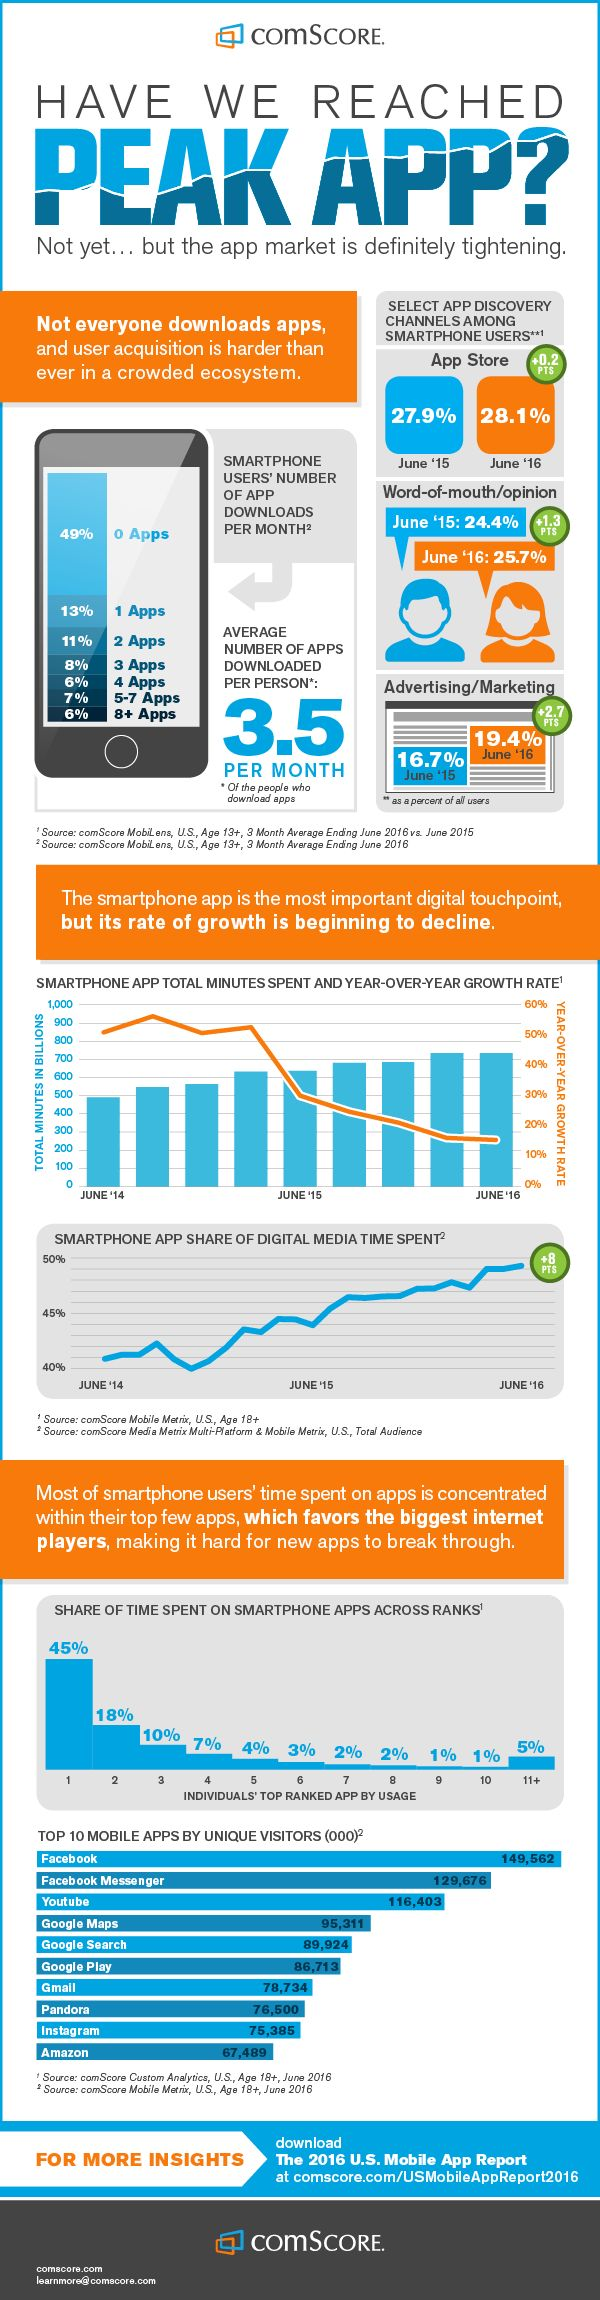 App Ecosystem at a peak? #RideTheMobileTsunami